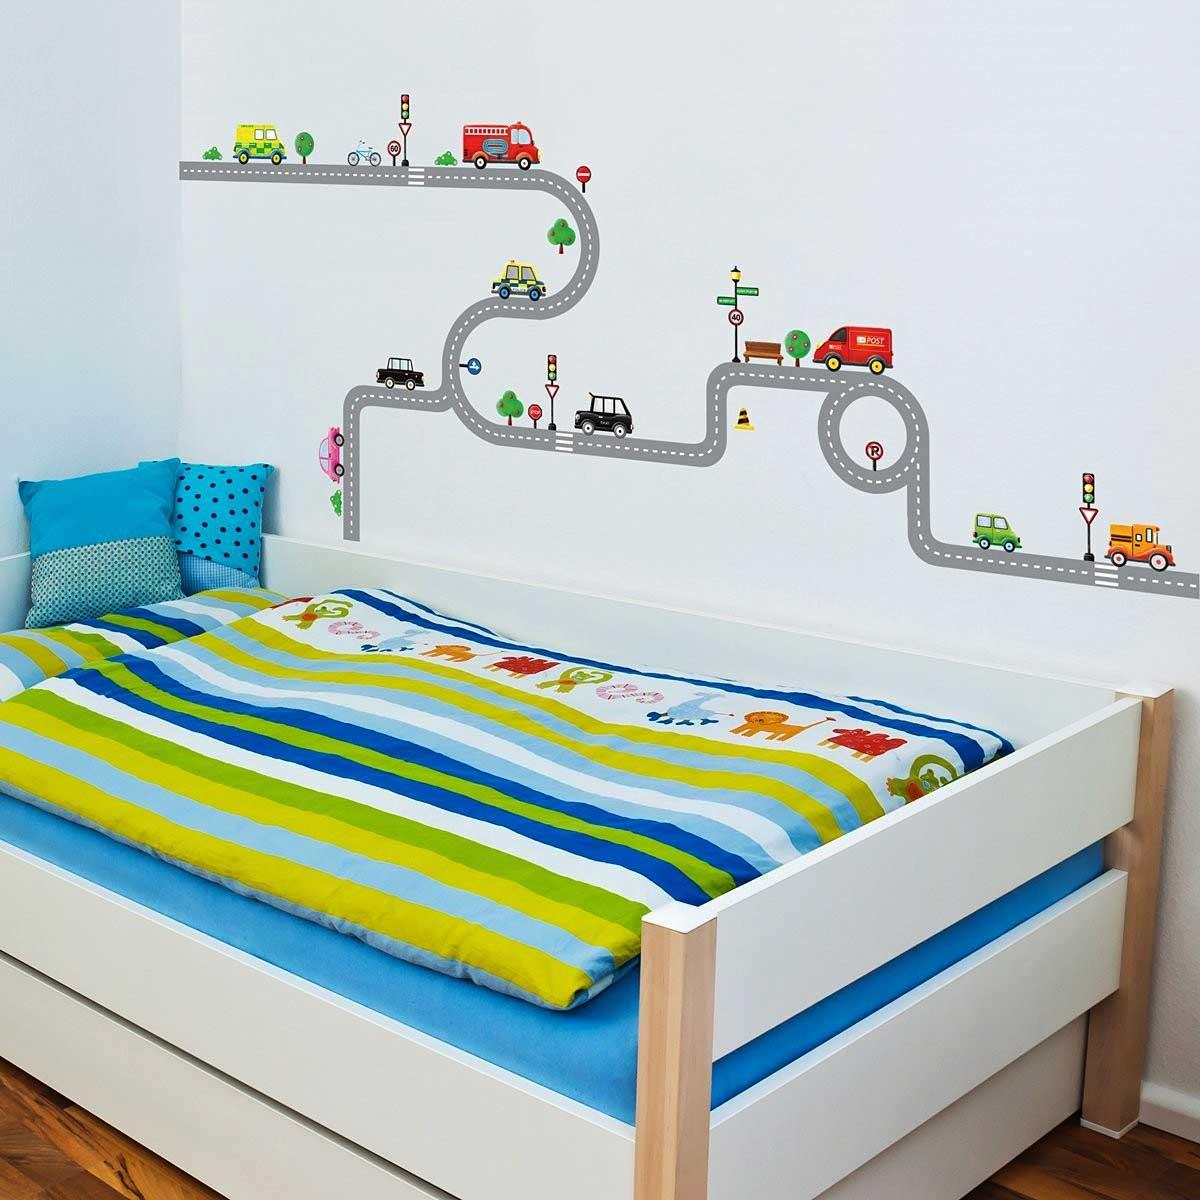 wandsticker wandpuzzle wandtattoo autobahn stra en autos. Black Bedroom Furniture Sets. Home Design Ideas